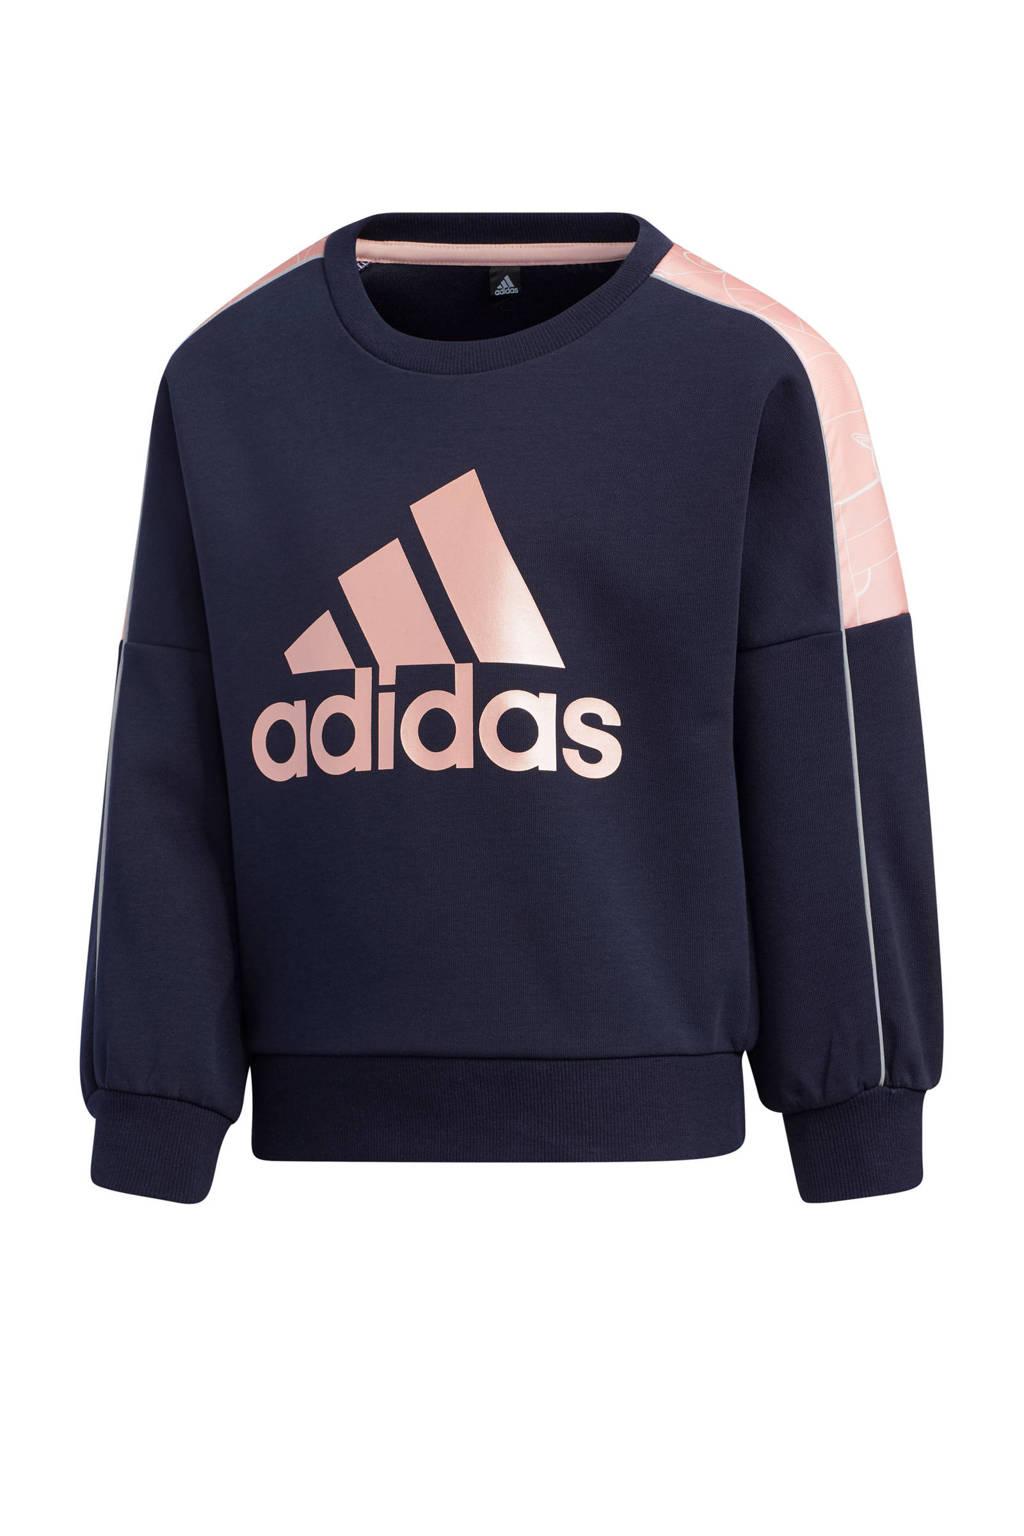 adidas Performance sportsweater donkerblauw/roze, Donkerblauw/roze